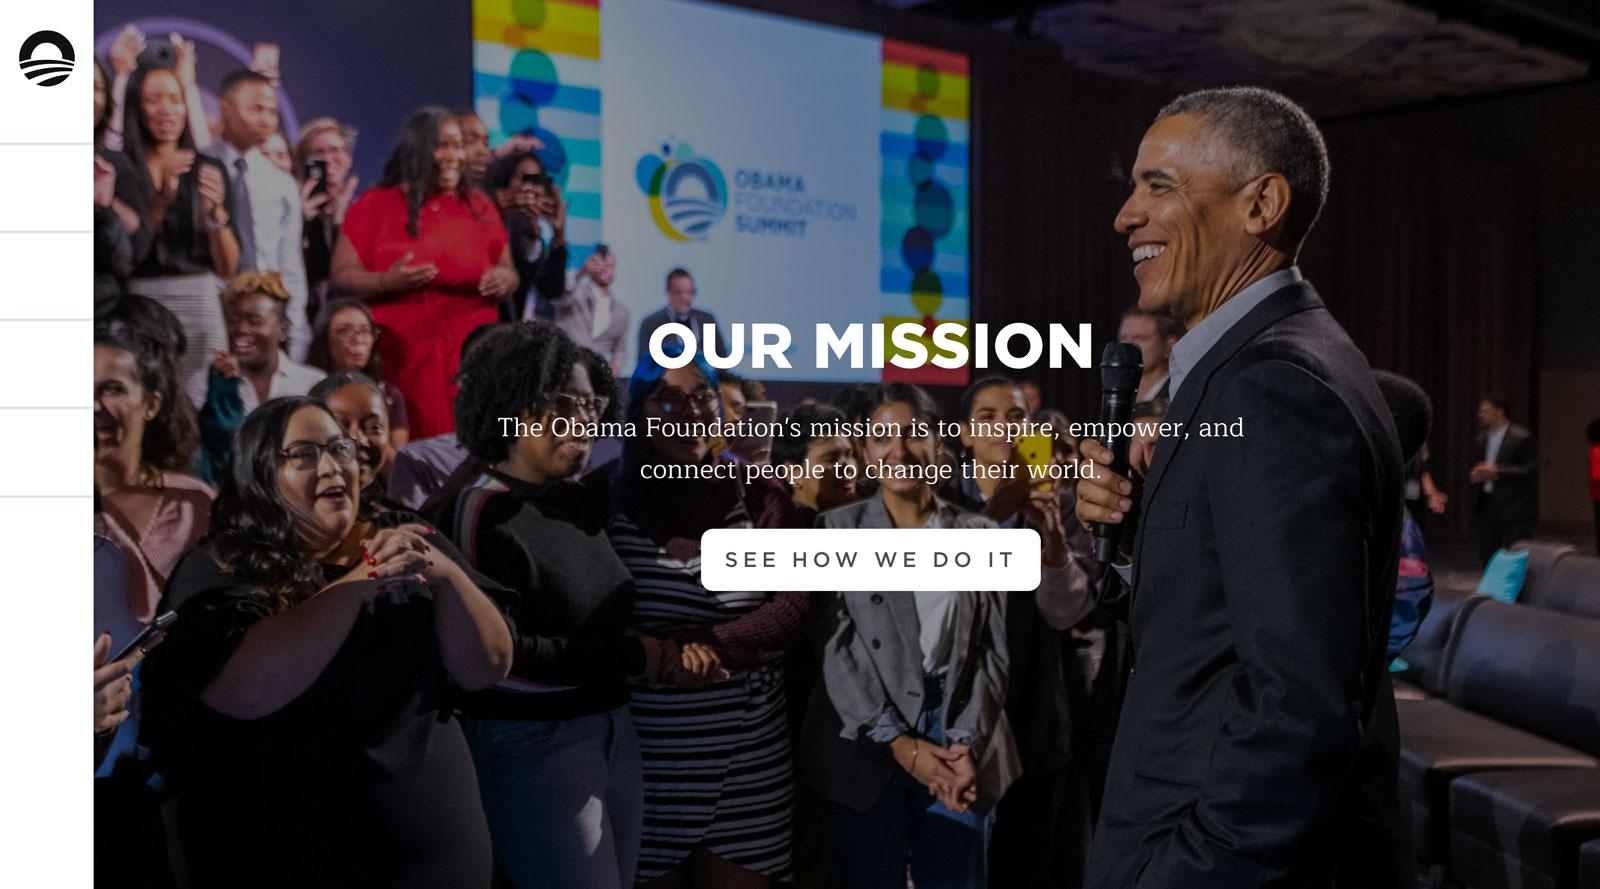 Tease image for The Obama Foundation